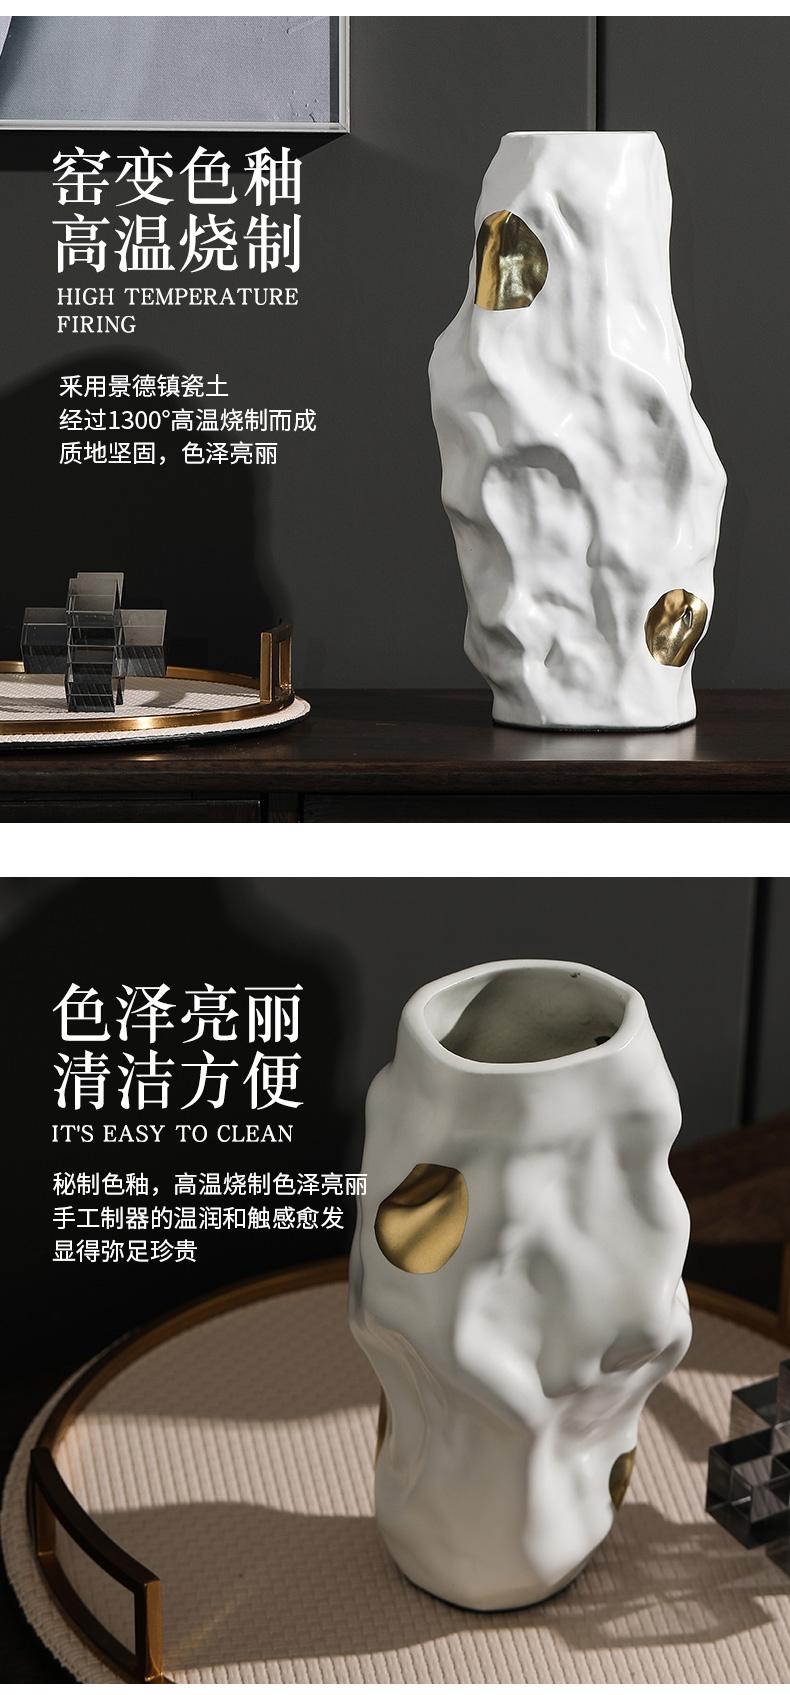 Rain tong household villa vase geometric fold vases, ceramic porcelain light soft decoration key-2 luxury furnishing articles example room